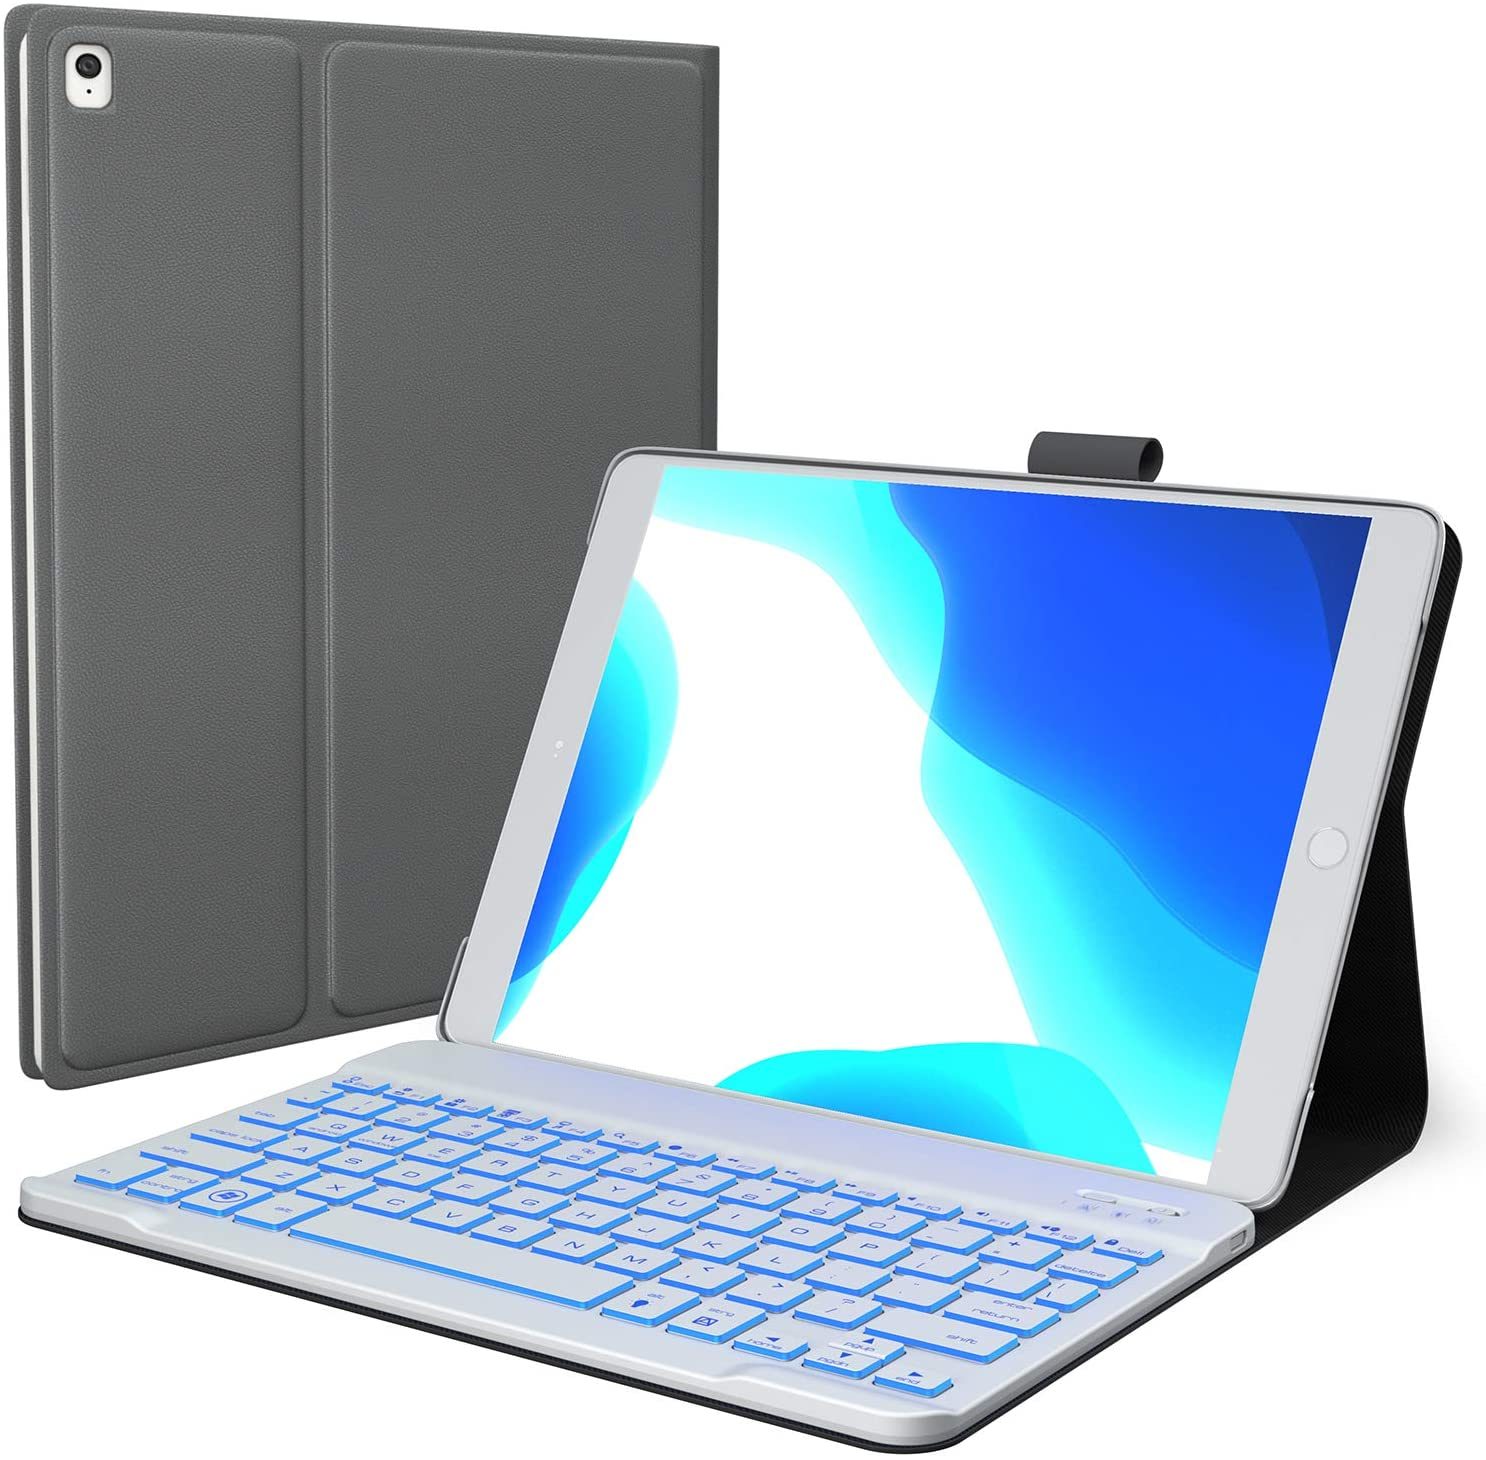 iPad 8th Generation Case with Keyboard, Compatible with iPad 10.2, iPad Air 3, iPad Pro 10.5 - Backlit, Wireless, Smart Keyboard Folio for Apple iPad - iPad 7th Generation Keyboard Case- Space Gray